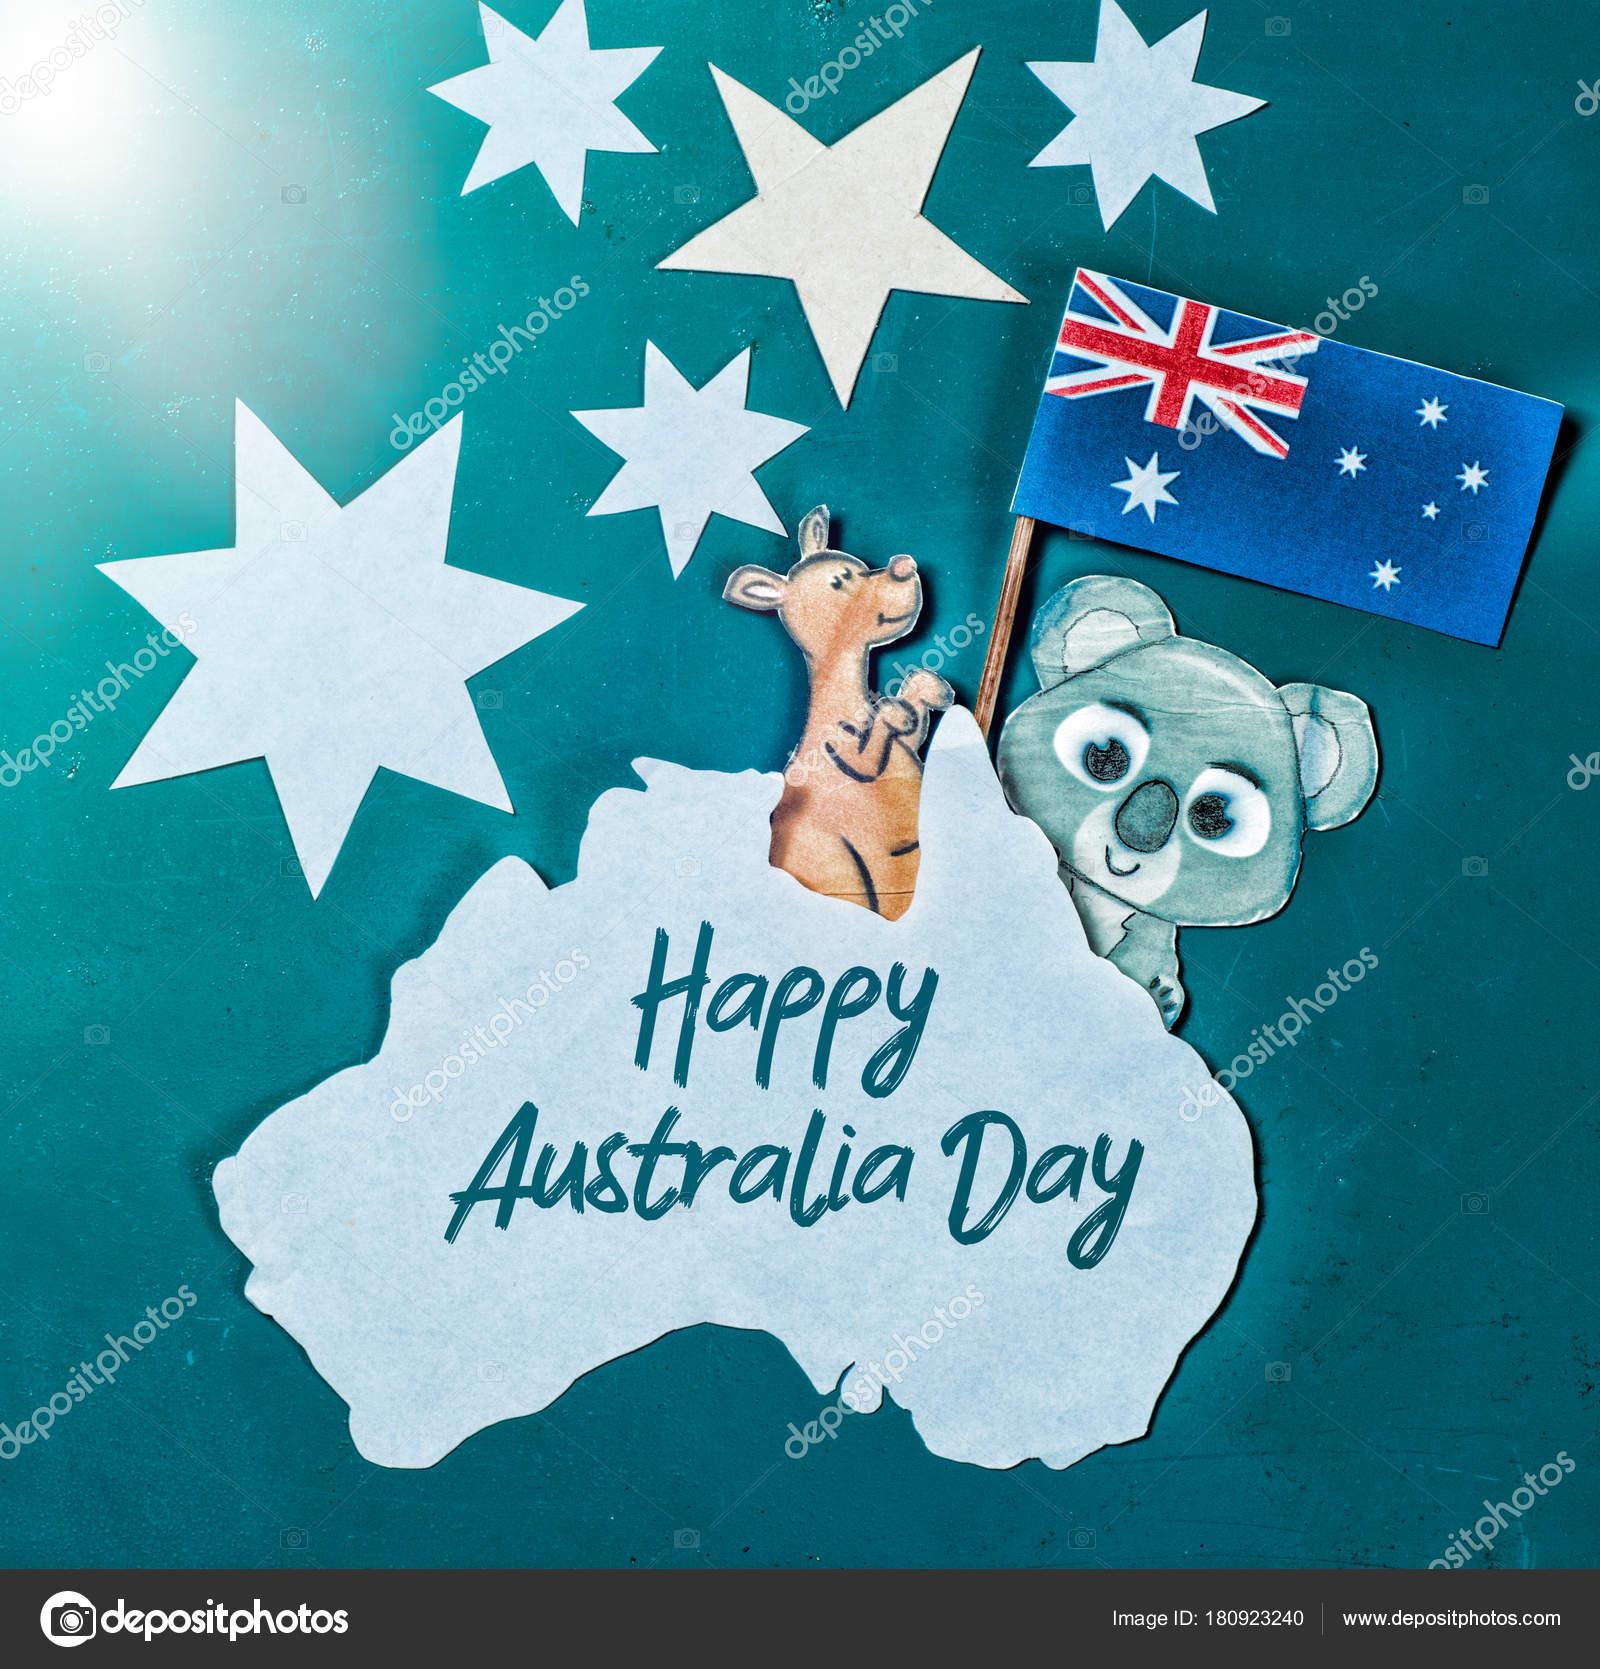 Holiday Greeting Message | Celebrate Australia Day Holiday January Happy Australia Day Message